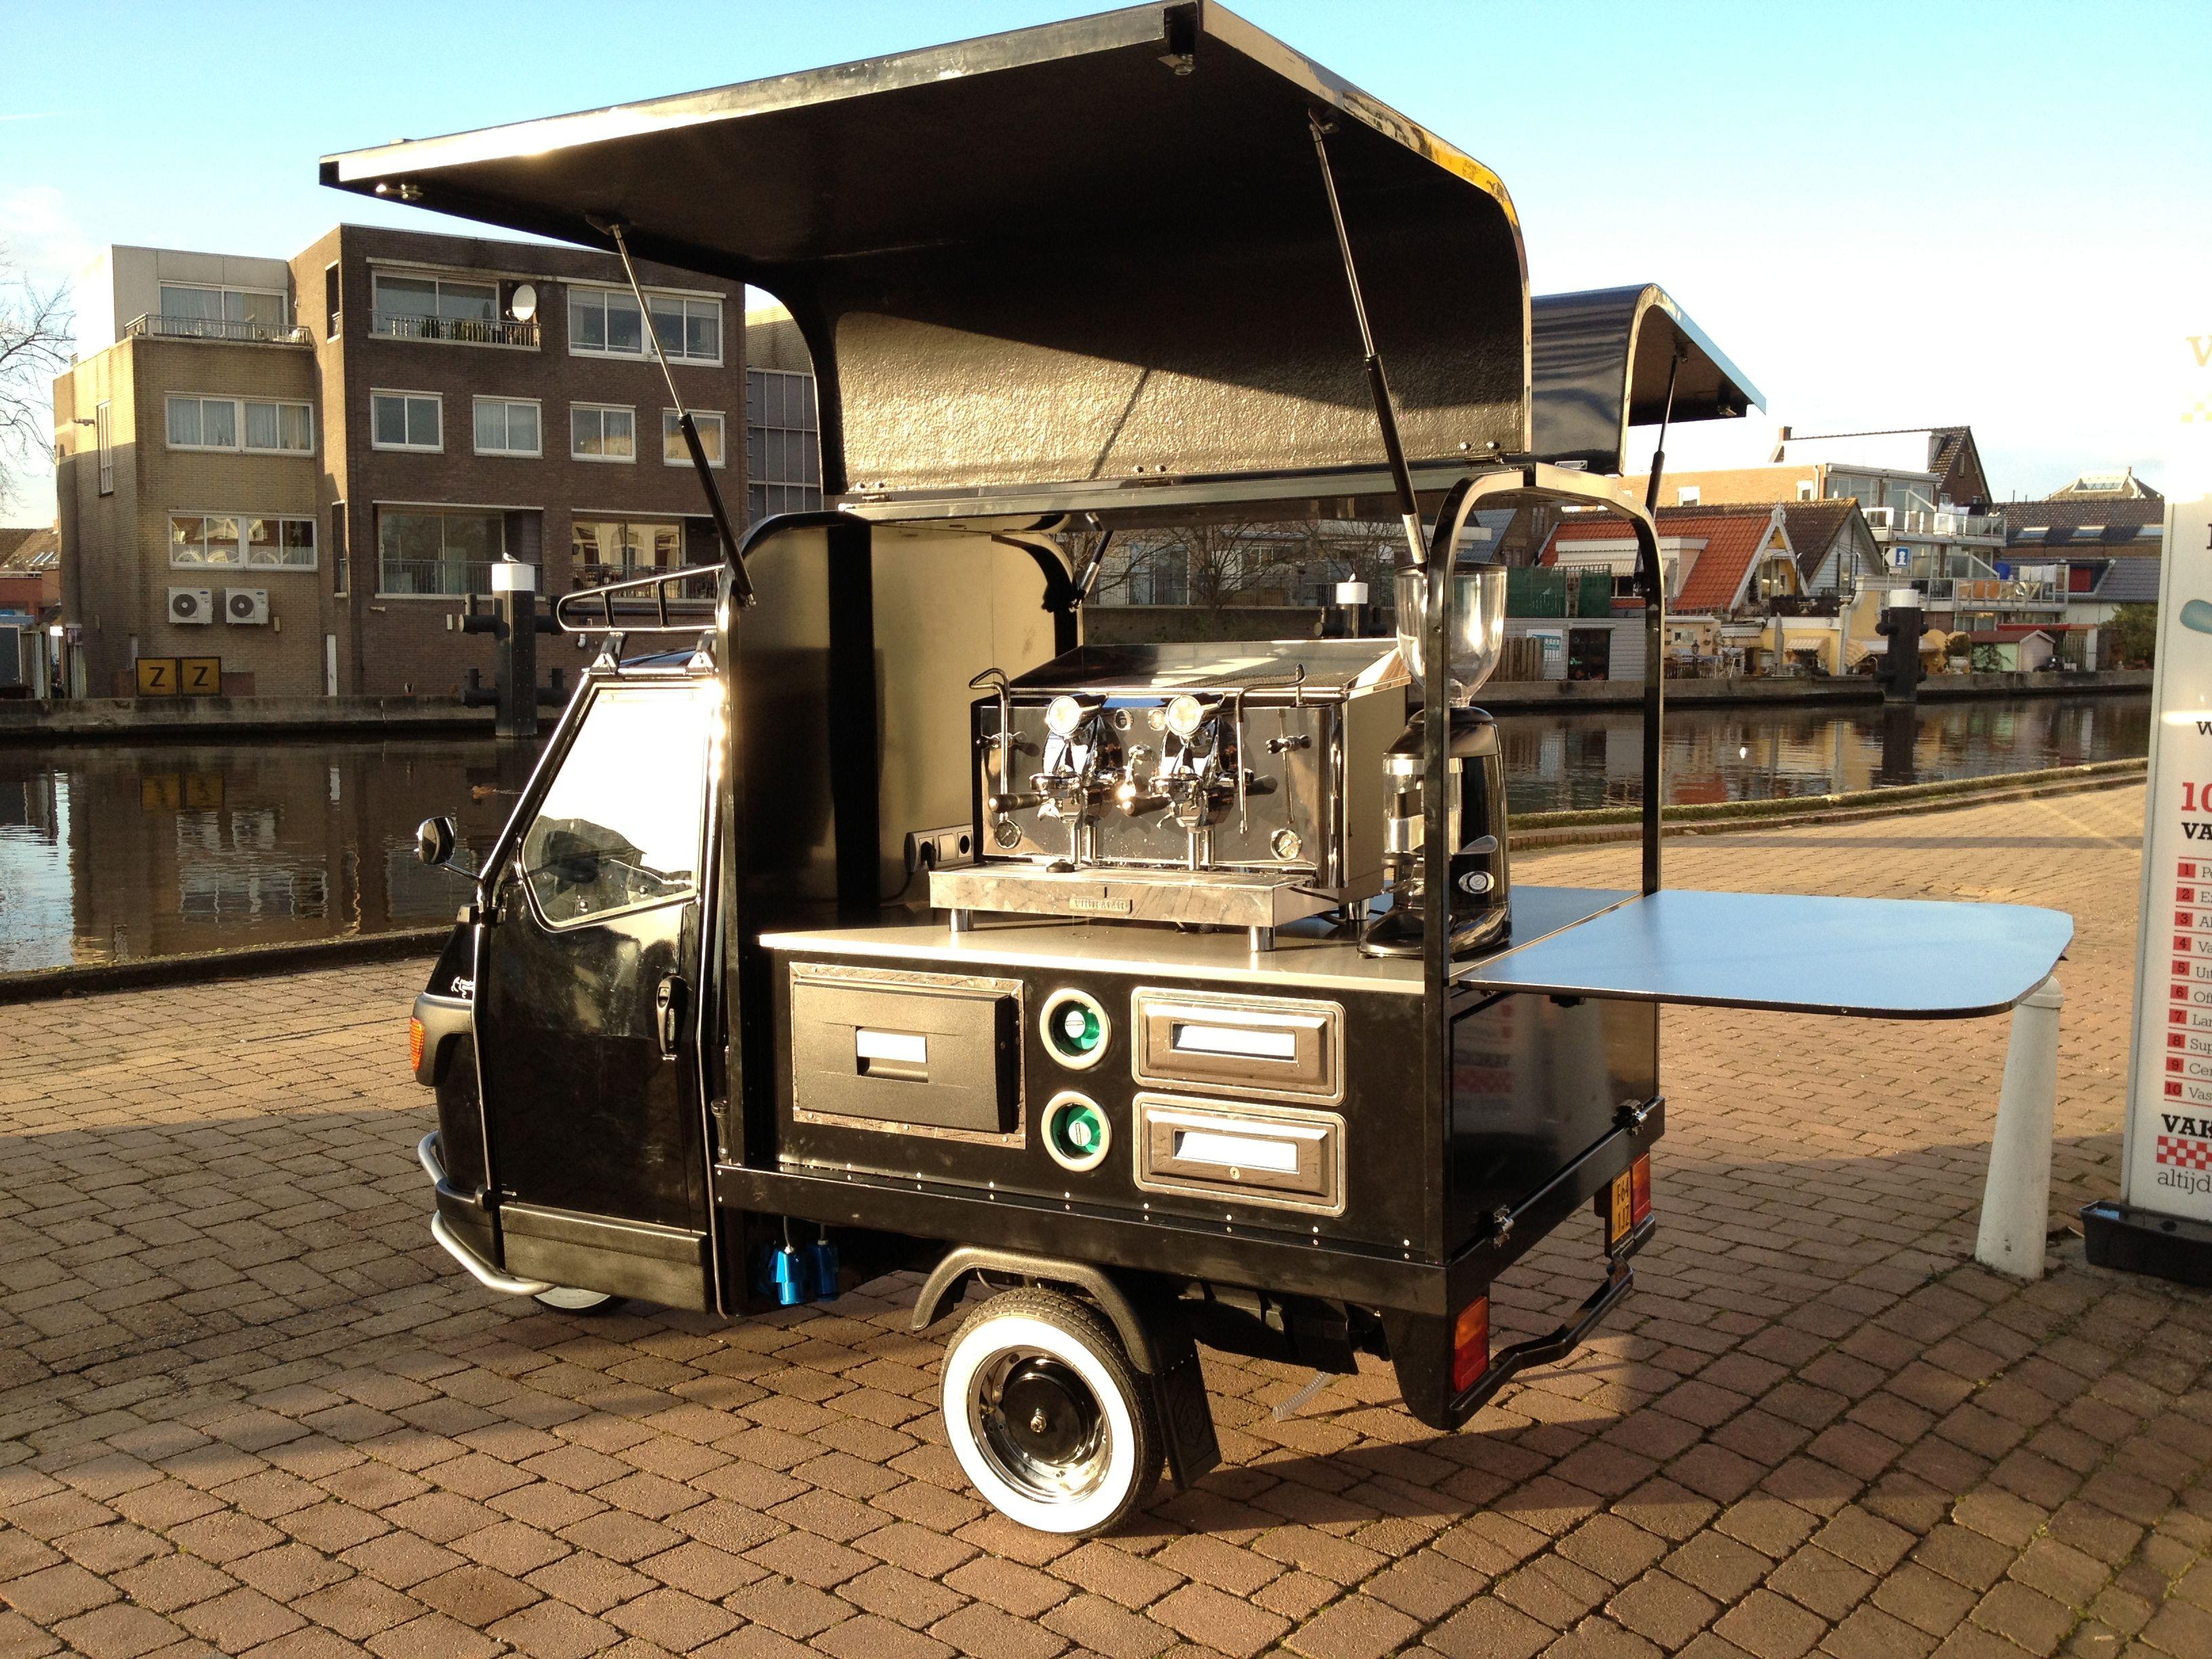 Cafeteria Movil Buscar Con Google Cafeteria Movil T Cafes